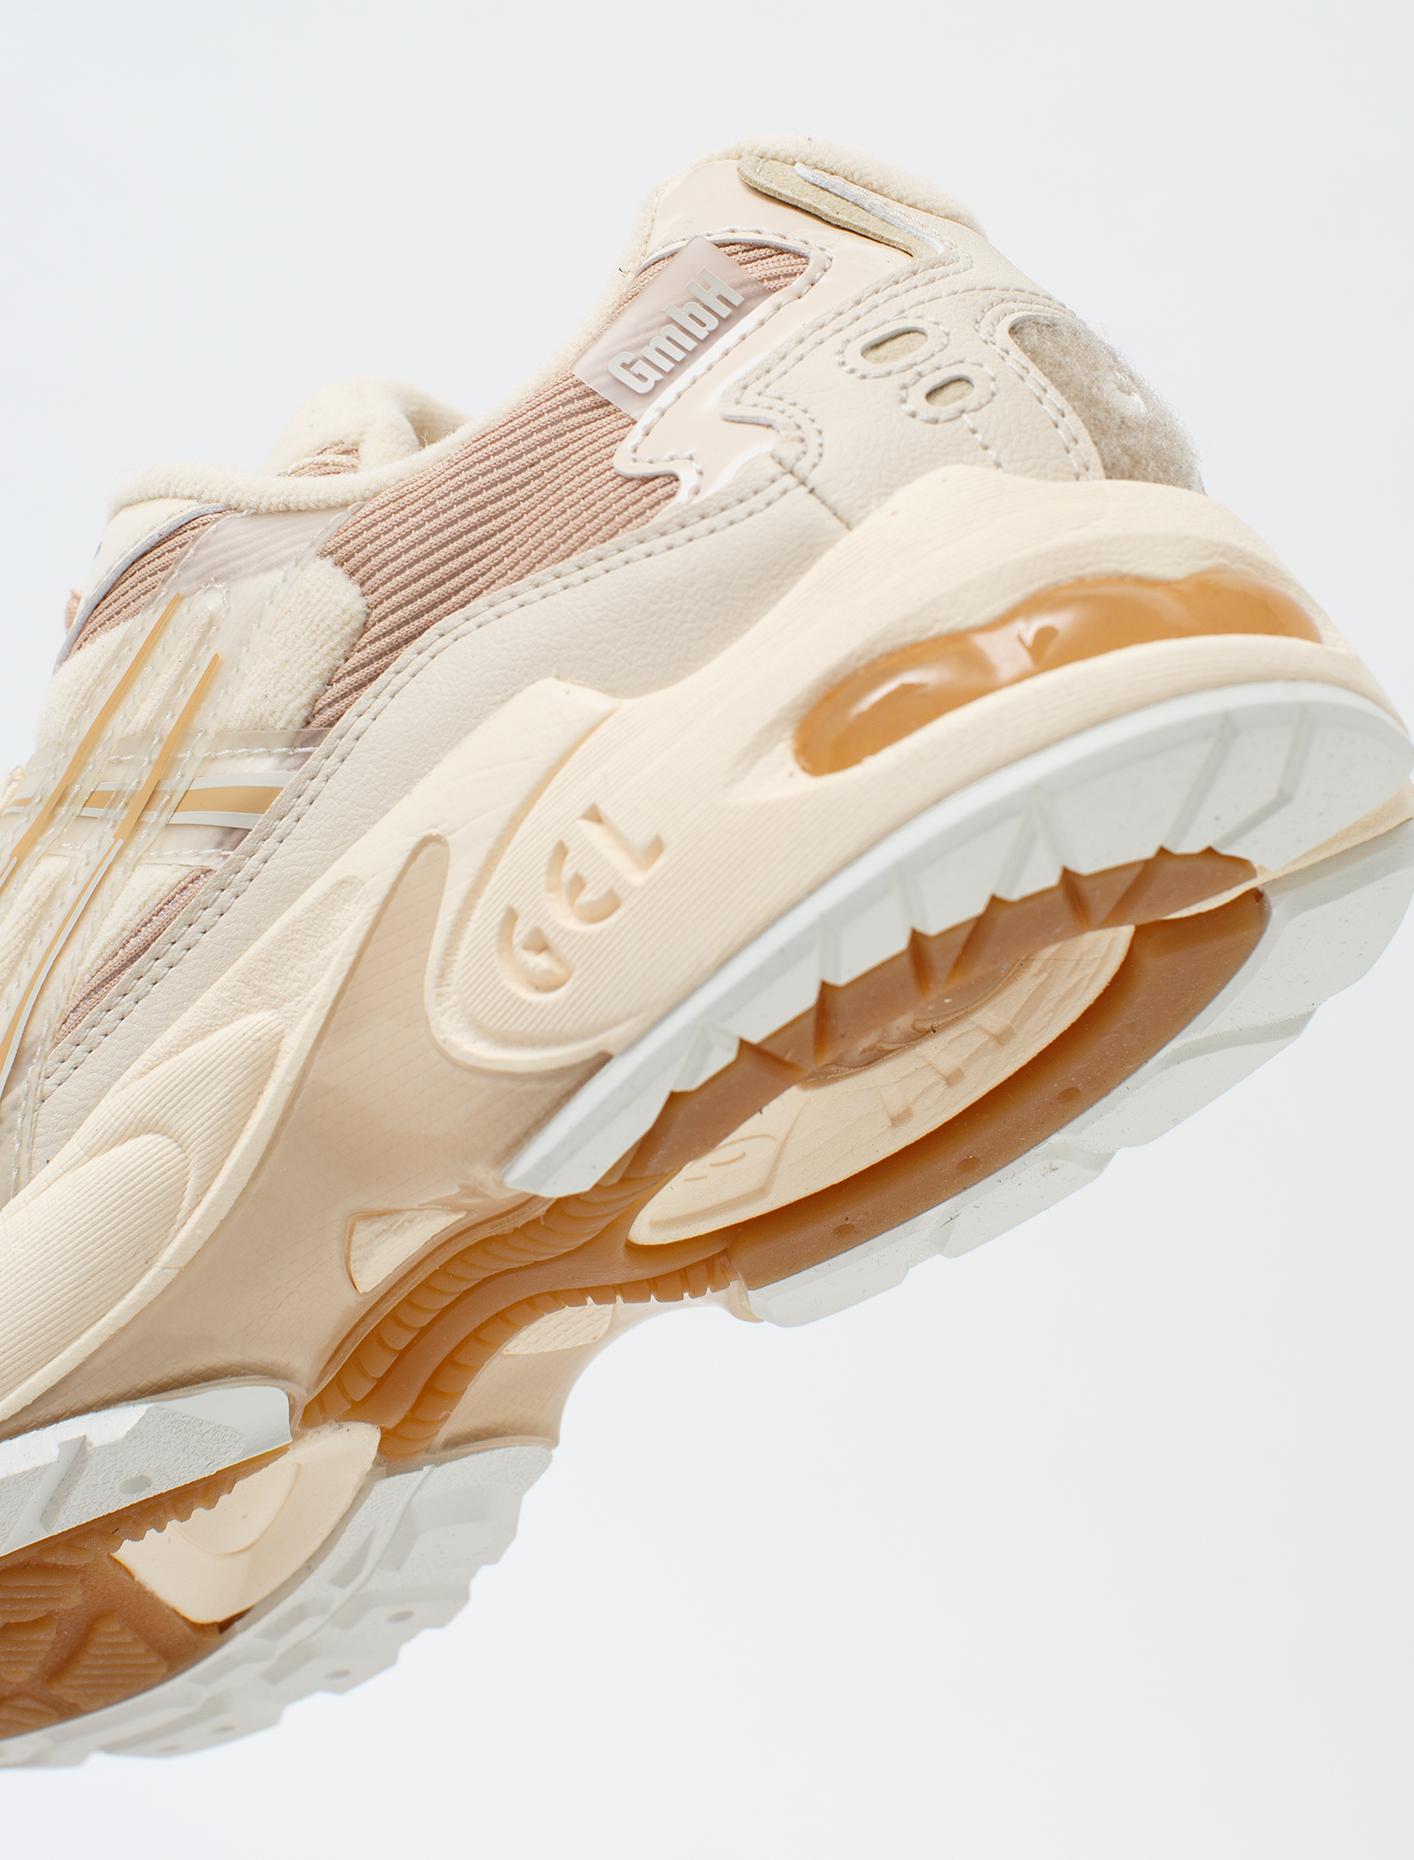 Details about ASICS GEL Cumulus 20 Running Shoe (Men's) in BurgundyBlack NEW